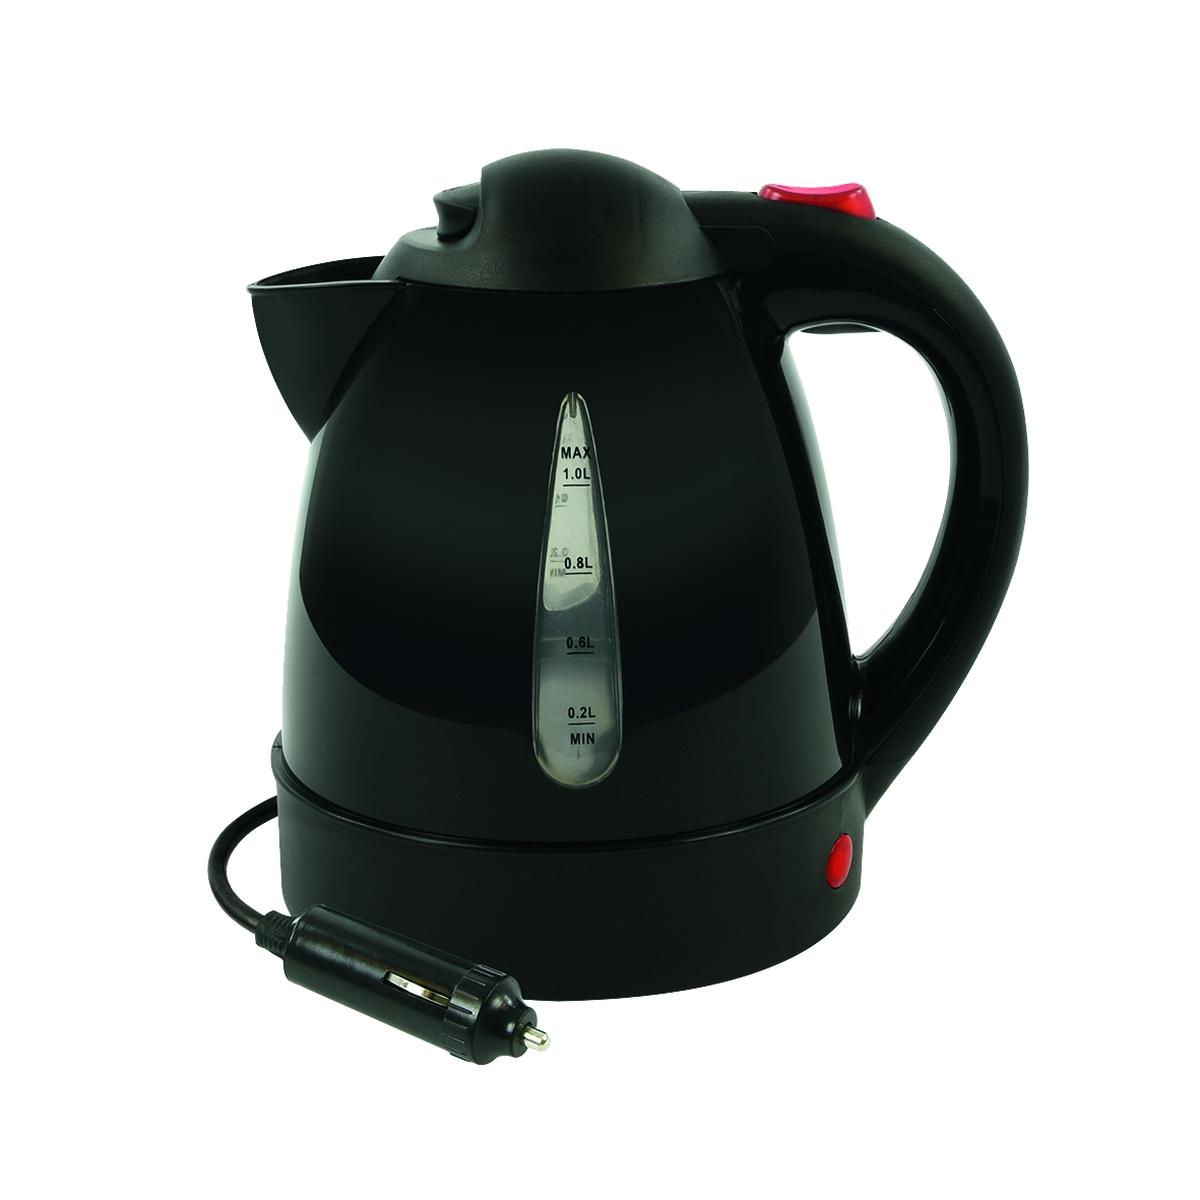 Wasserkocher 12 V - 1 l